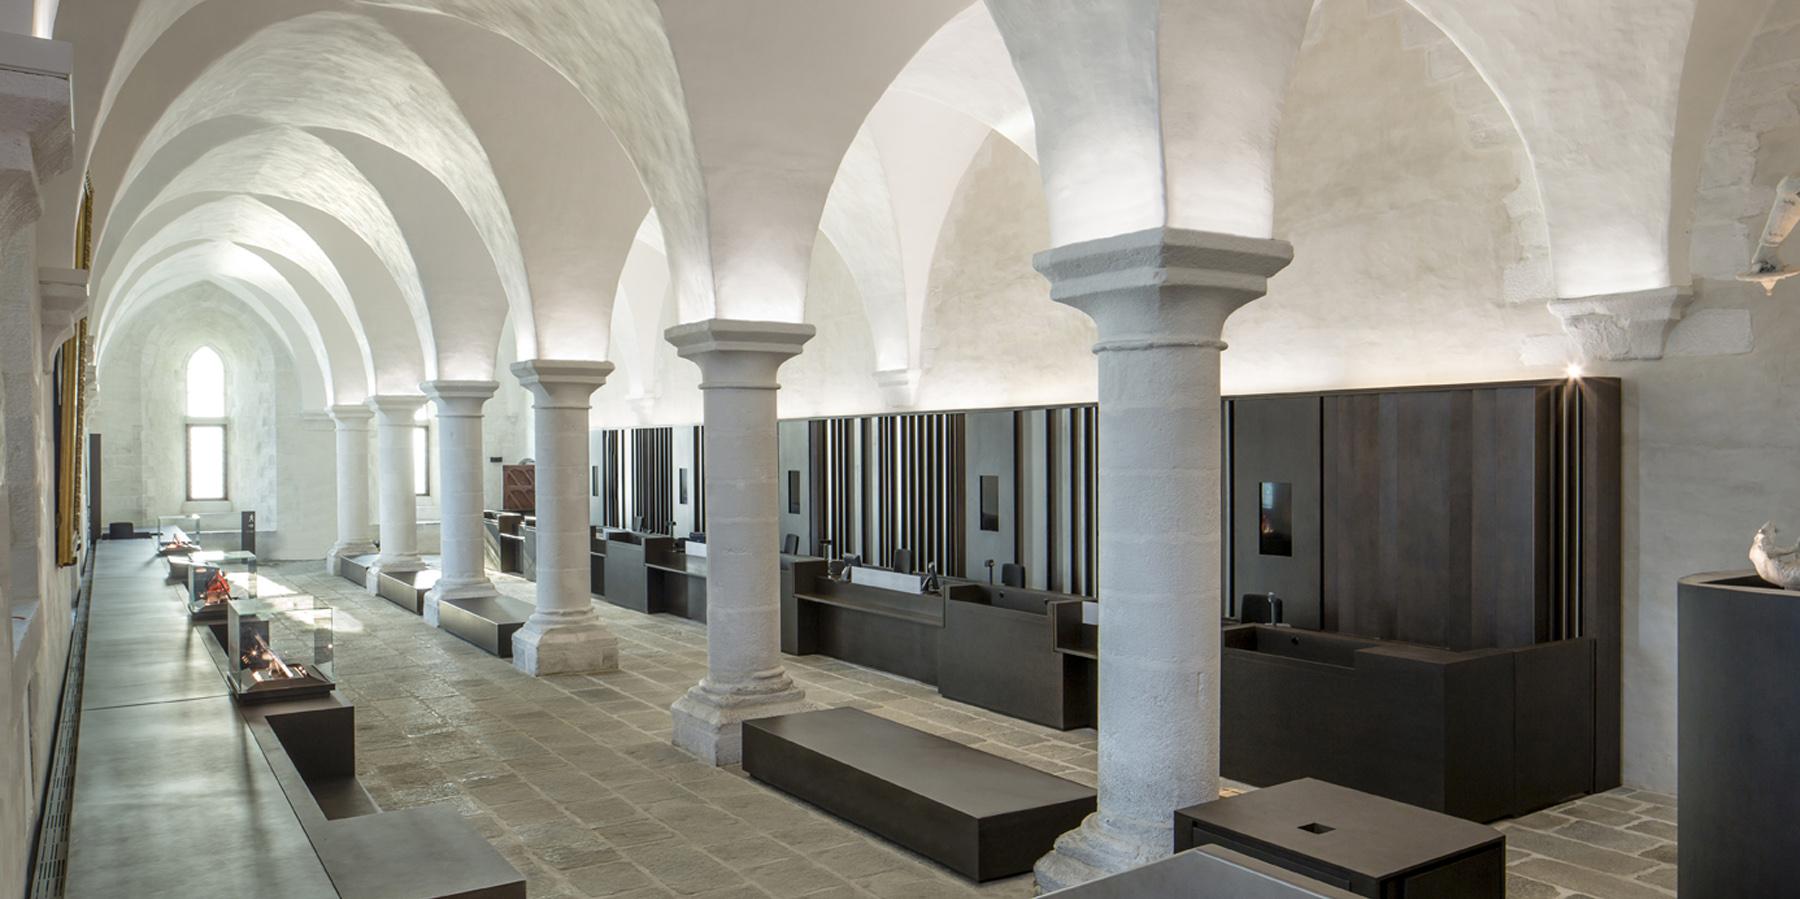 abbaye du mont saint michel dda architectes. Black Bedroom Furniture Sets. Home Design Ideas